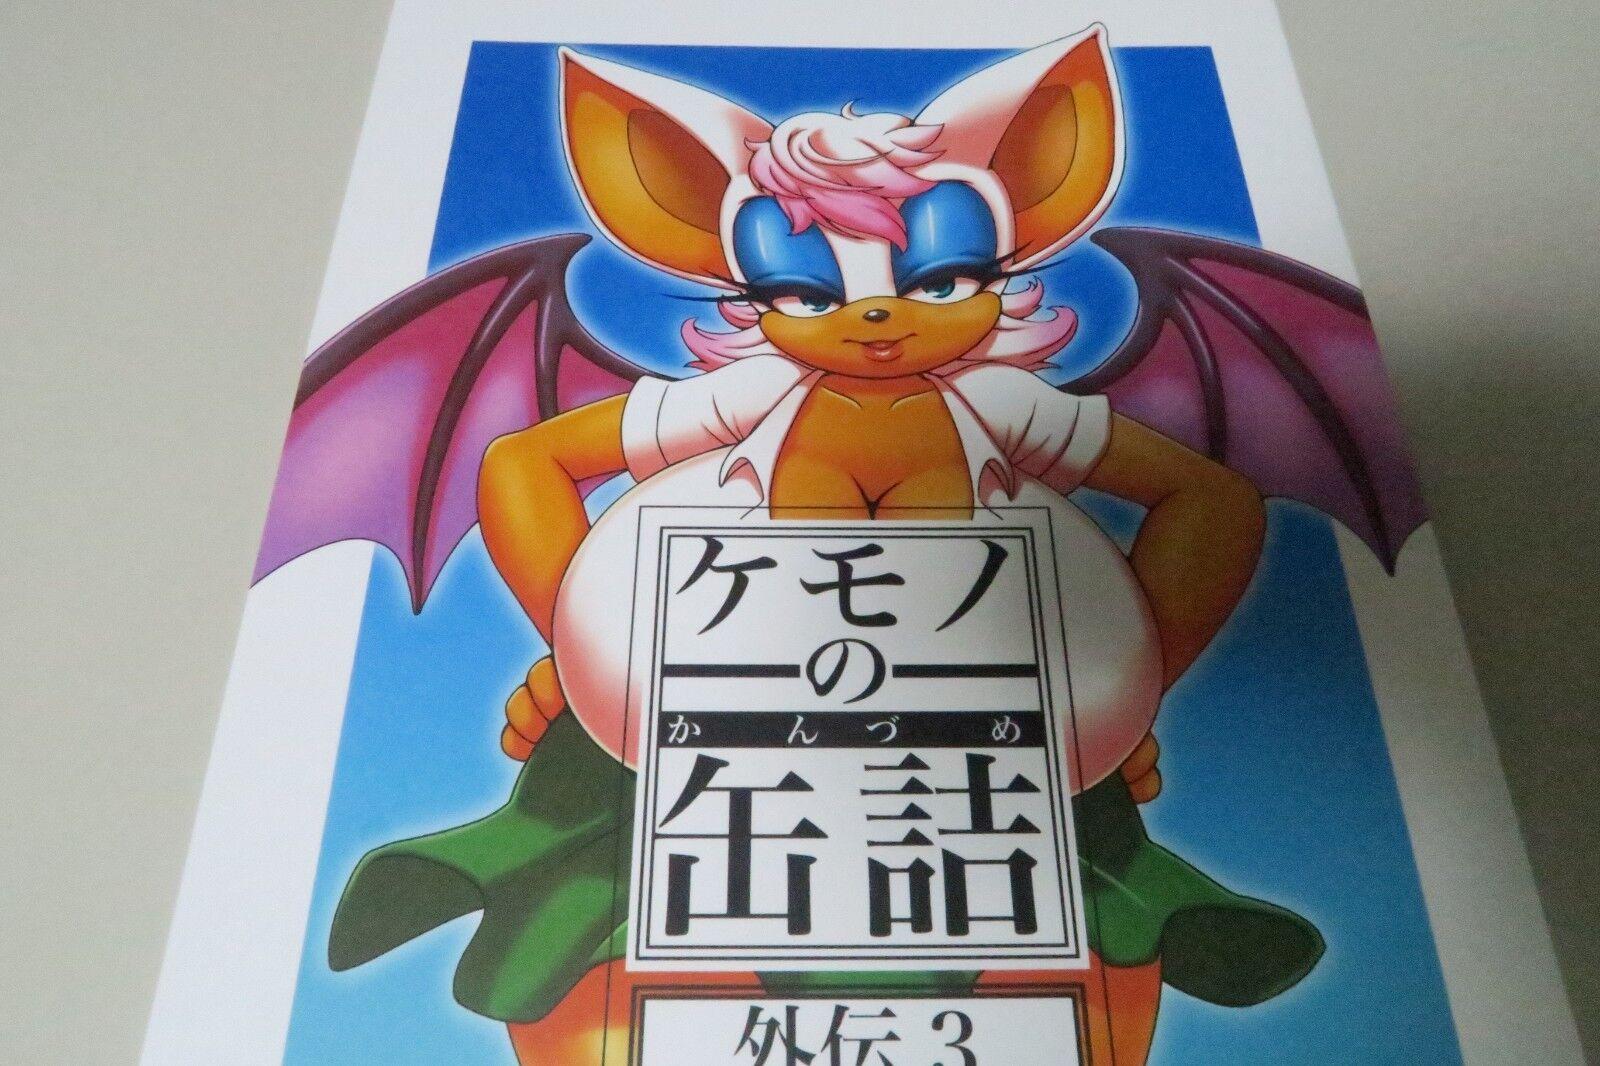 Rossciaco Furry Kemono Yaoi 40P//B5 Doujinshi Kuroda-kun no Tokubetsu Jugyou II